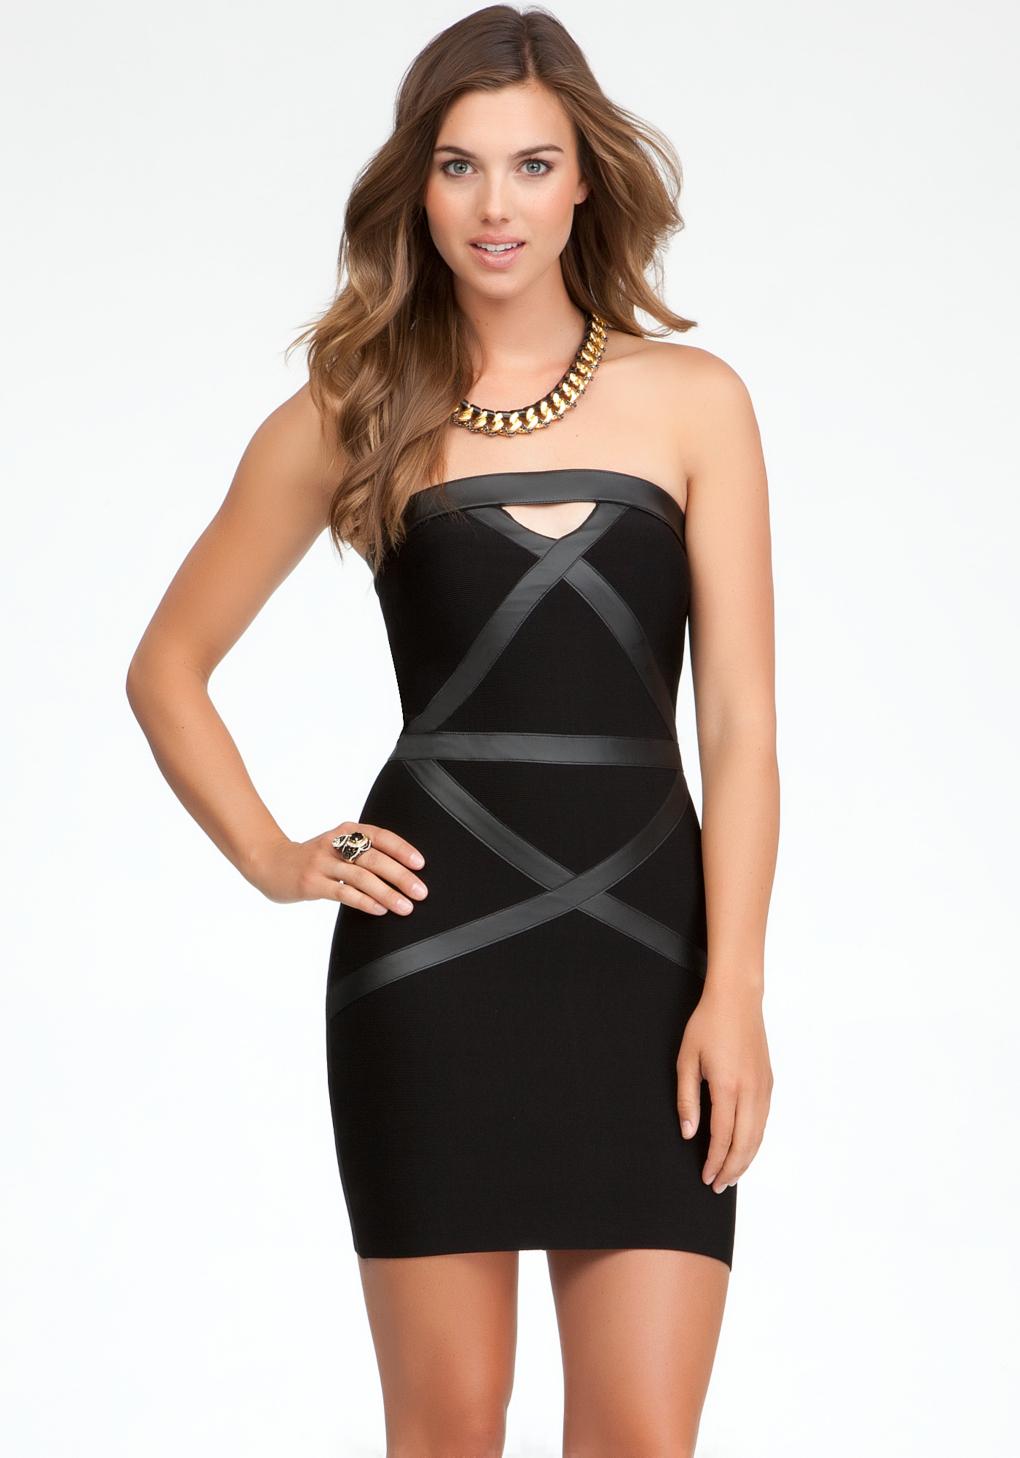 Lyst Bebe Strapless Leatherette Bandage Dress In Black